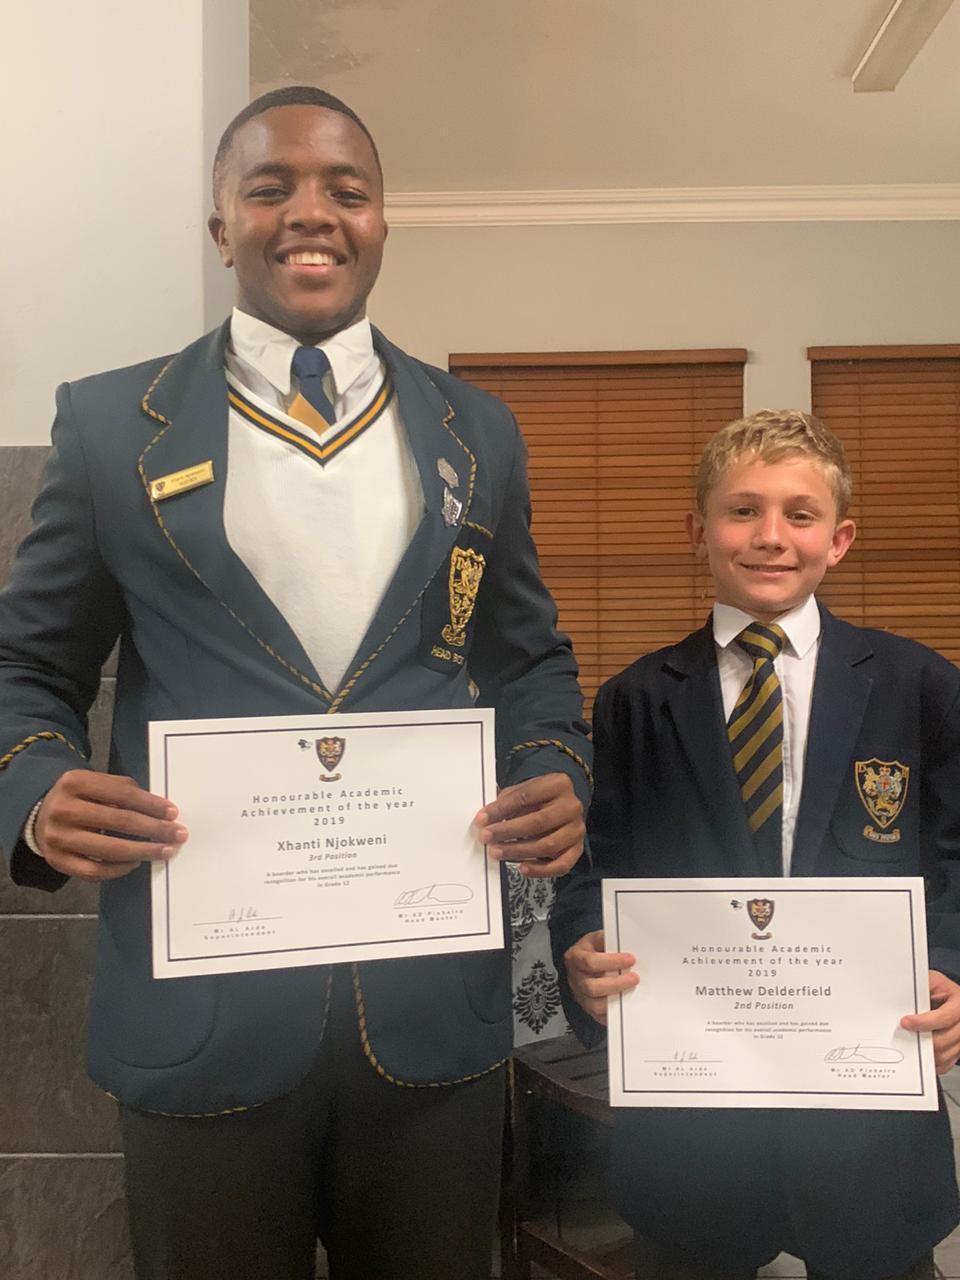 Xhanti Njokweni with Grade 8, Daniel Delderfield